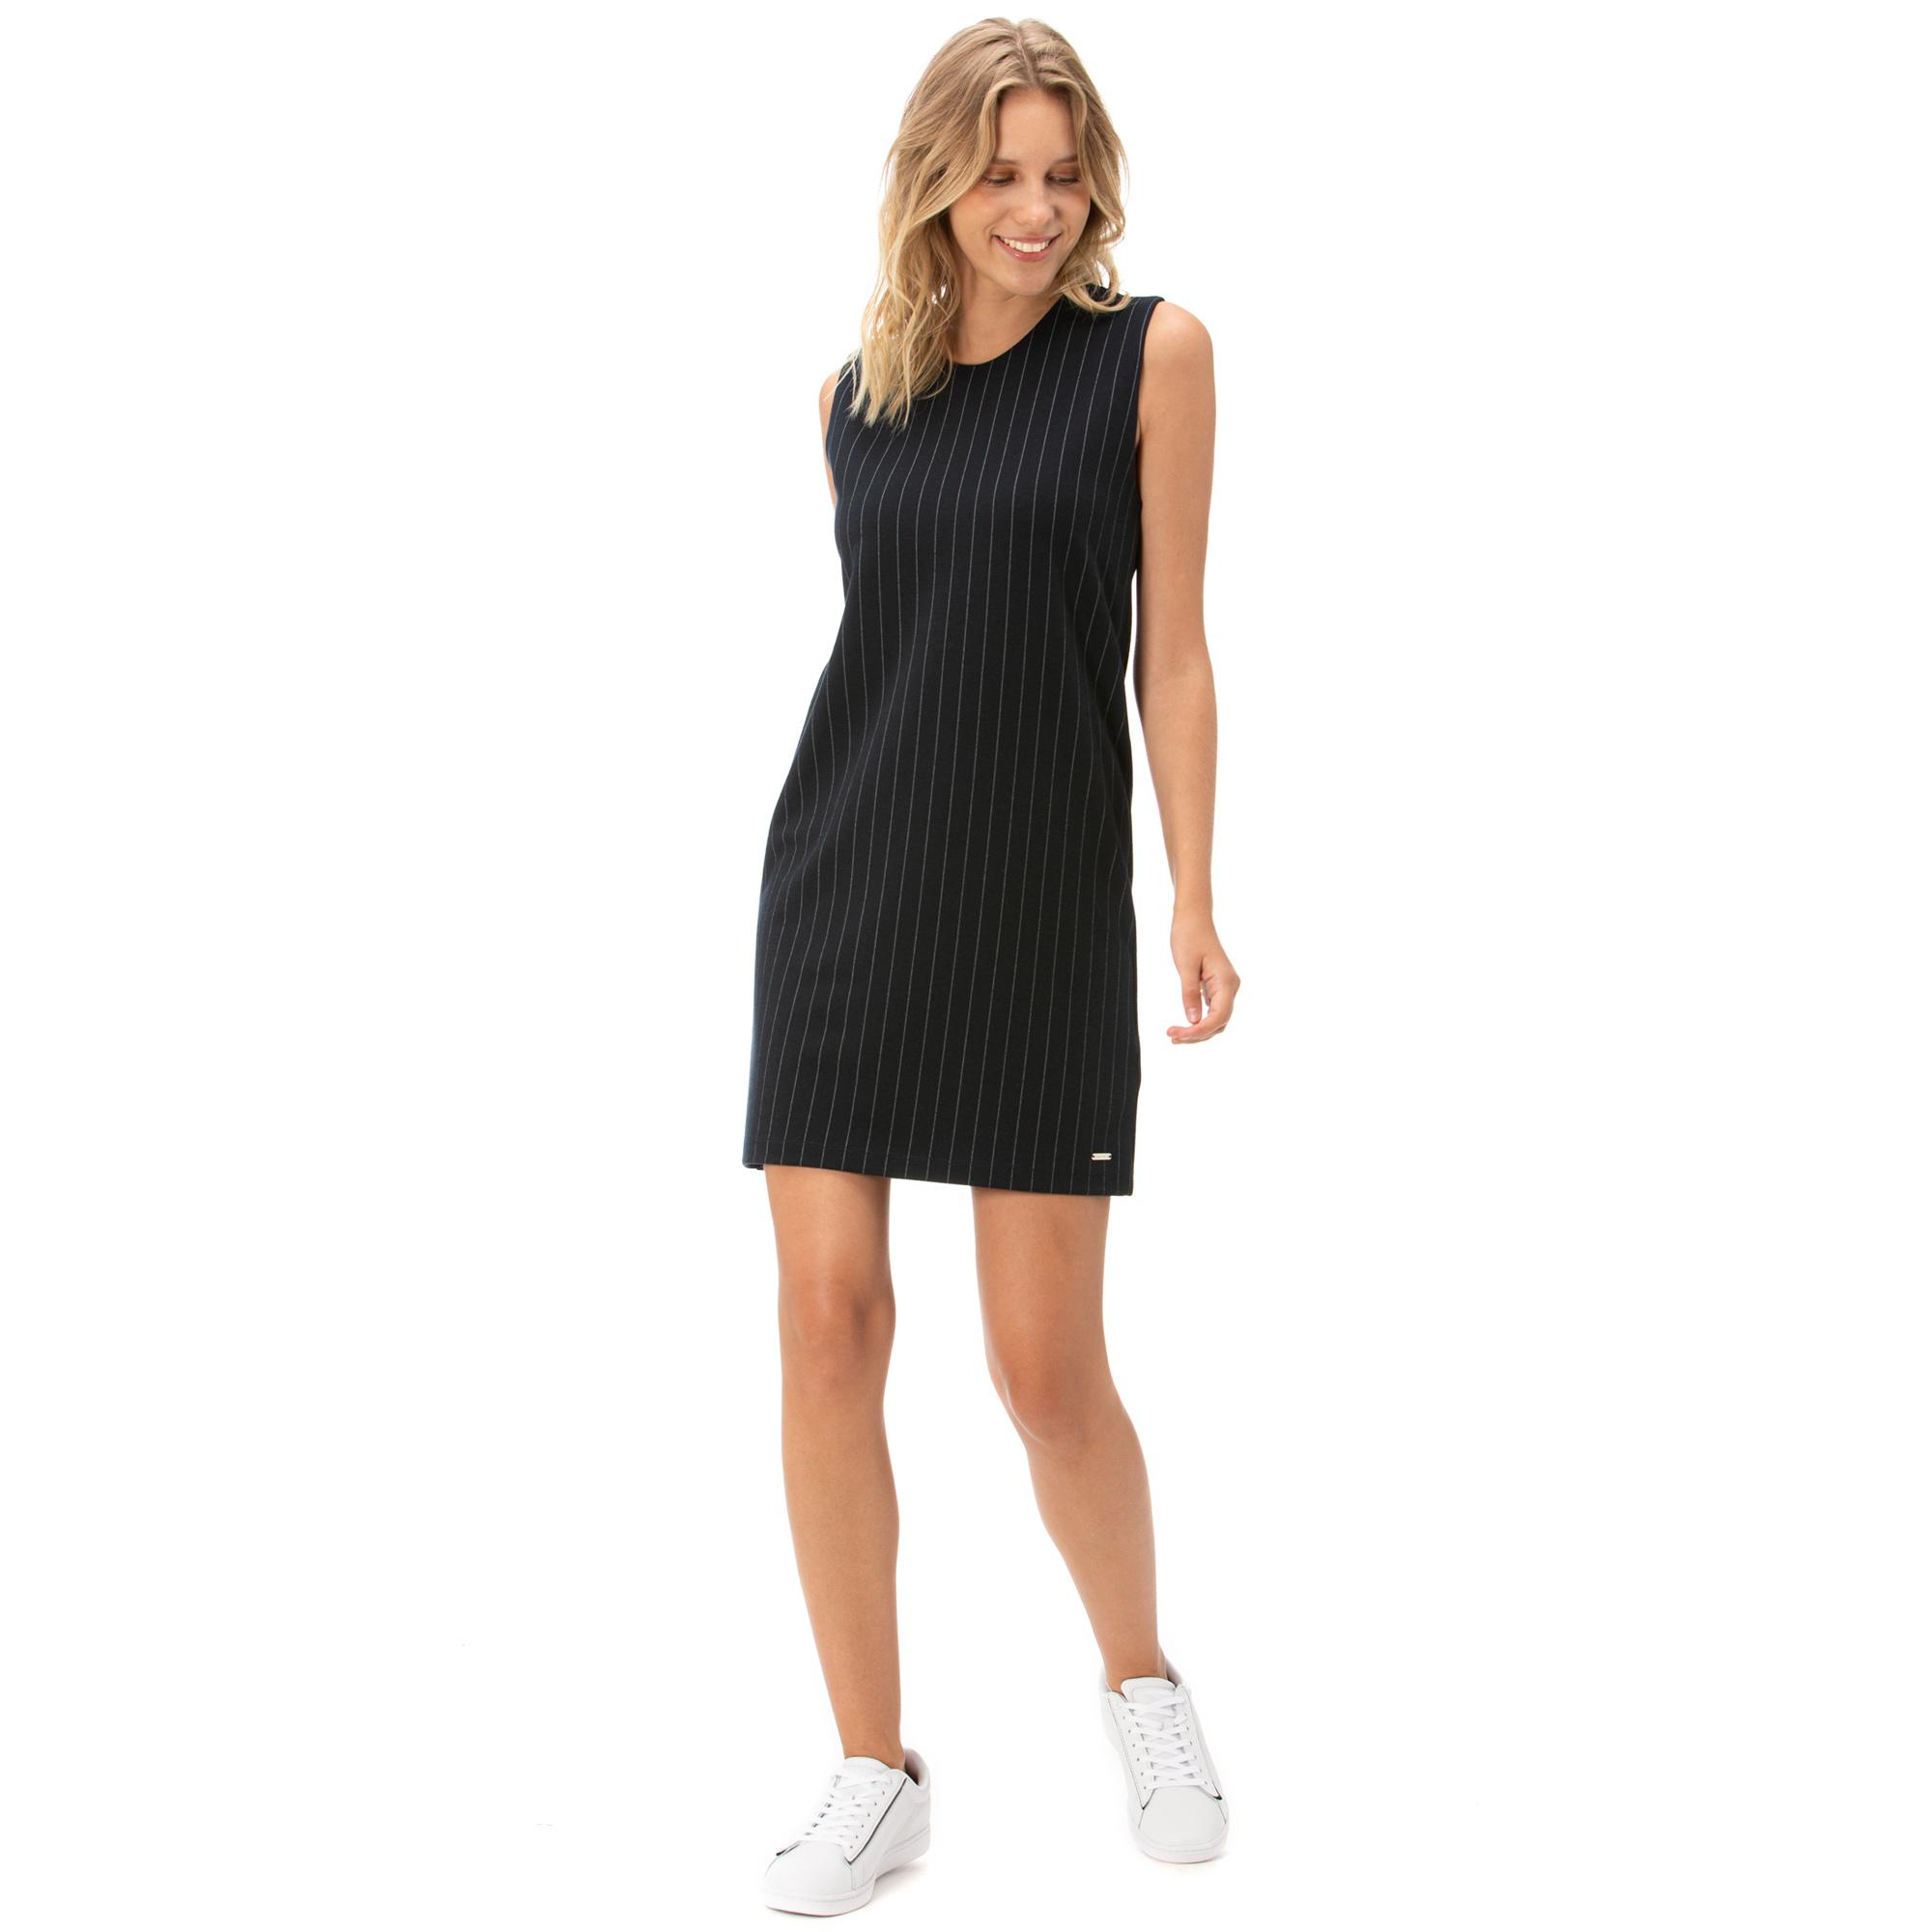 NAUTICA Kadın Lacivert Kolsuz Standart Fit Çizgili Elbise